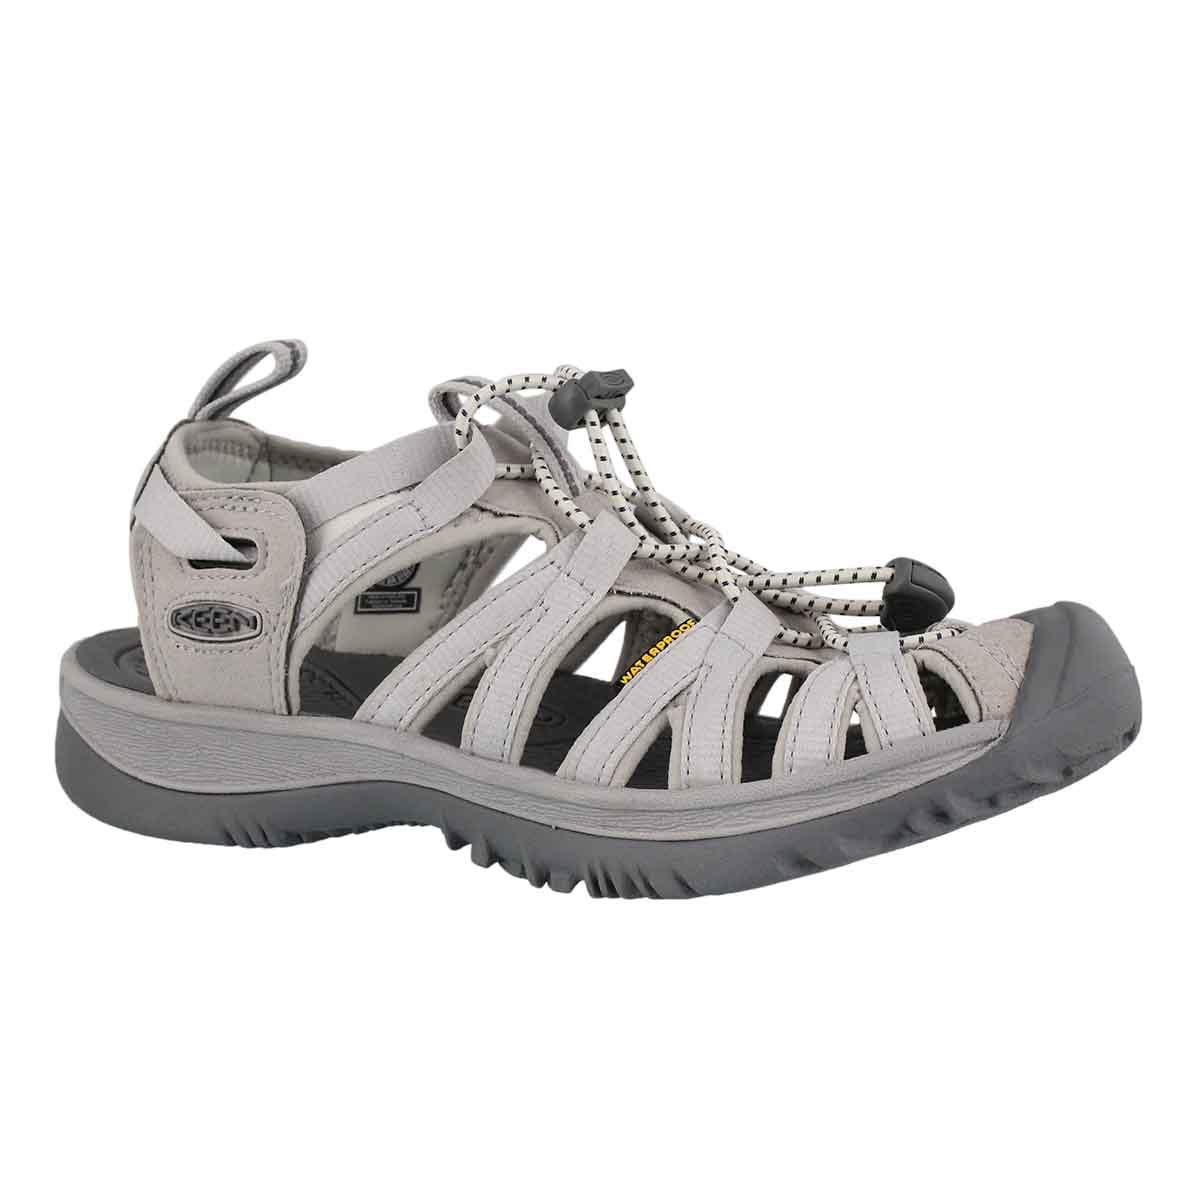 Women's WHISPER vapor/steel grey sport sandals